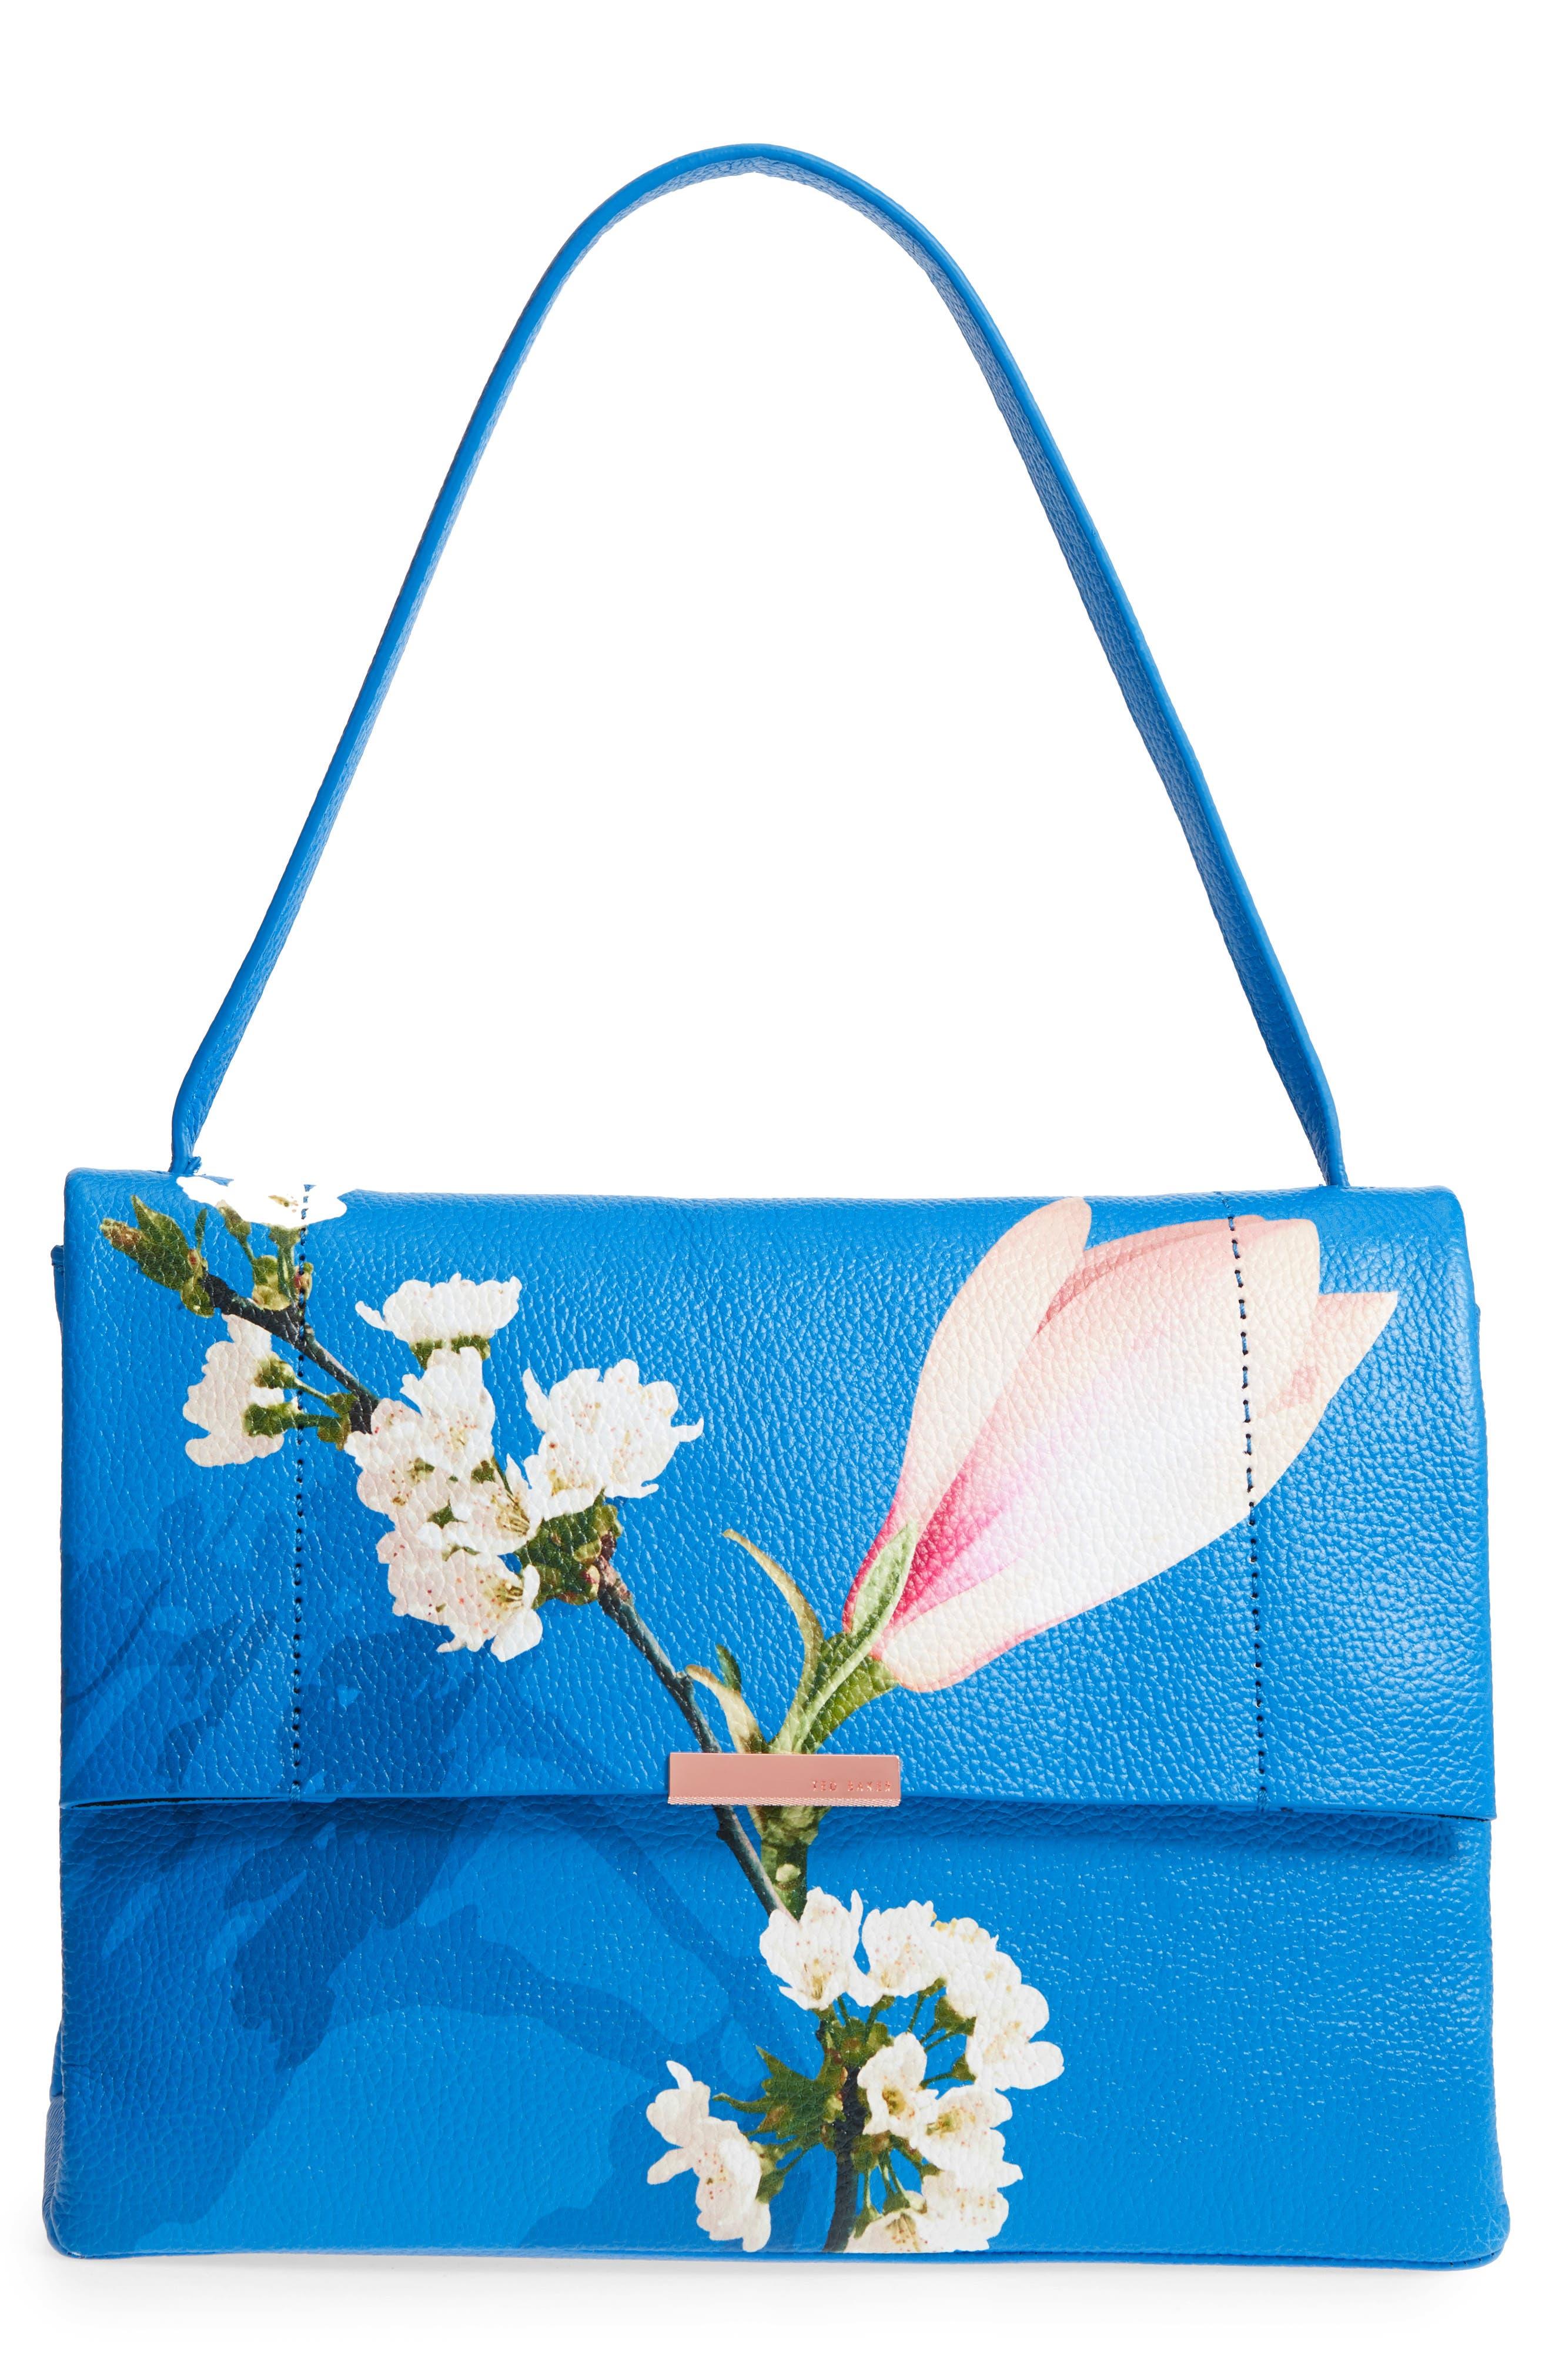 Heeidi Harmony Print Leather Shoulder Bag,                         Main,                         color, Bright Blue